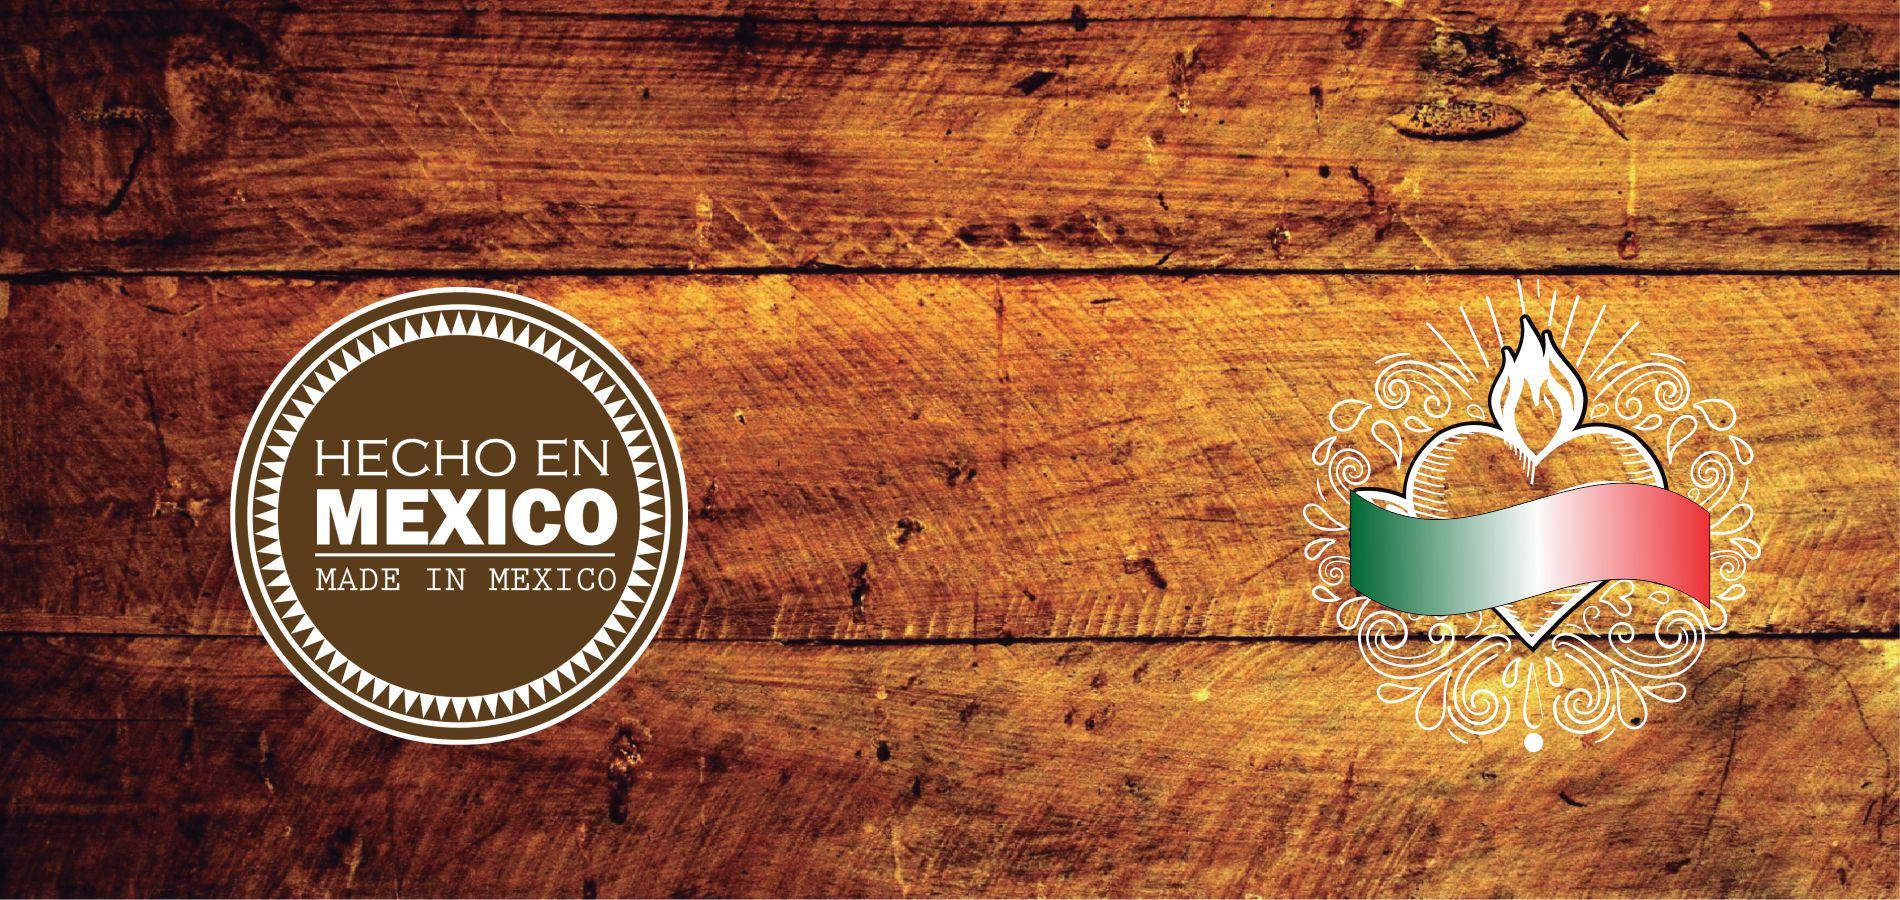 Fondo De Comida Mexicana: Hecho En Mexico-Made In Mexico Grill Taqueria Drinks & Beer